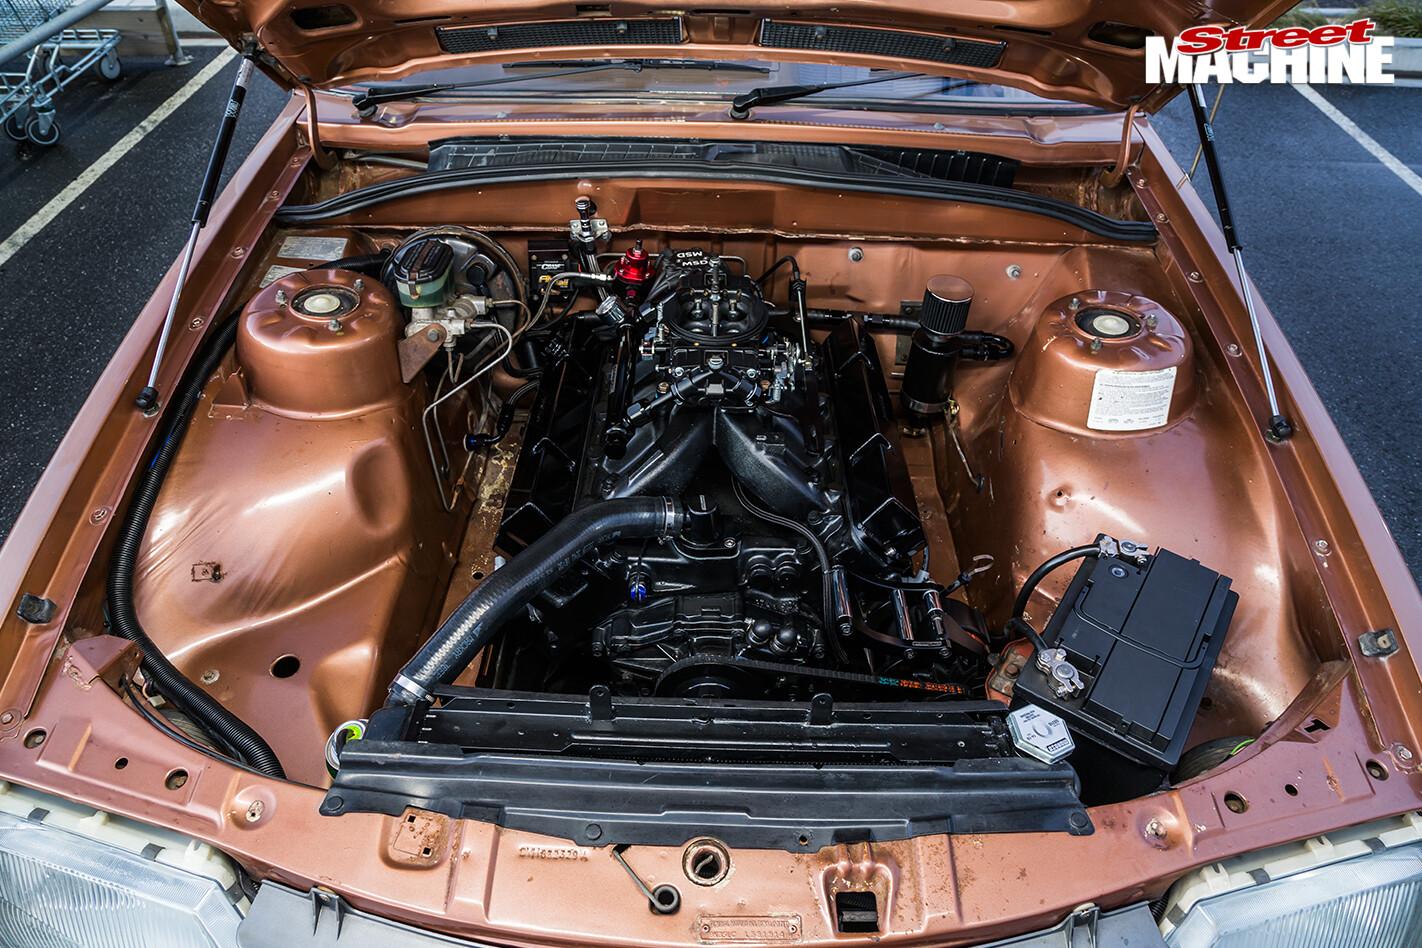 Holden -vh -vacationer -wagon -engine -bay